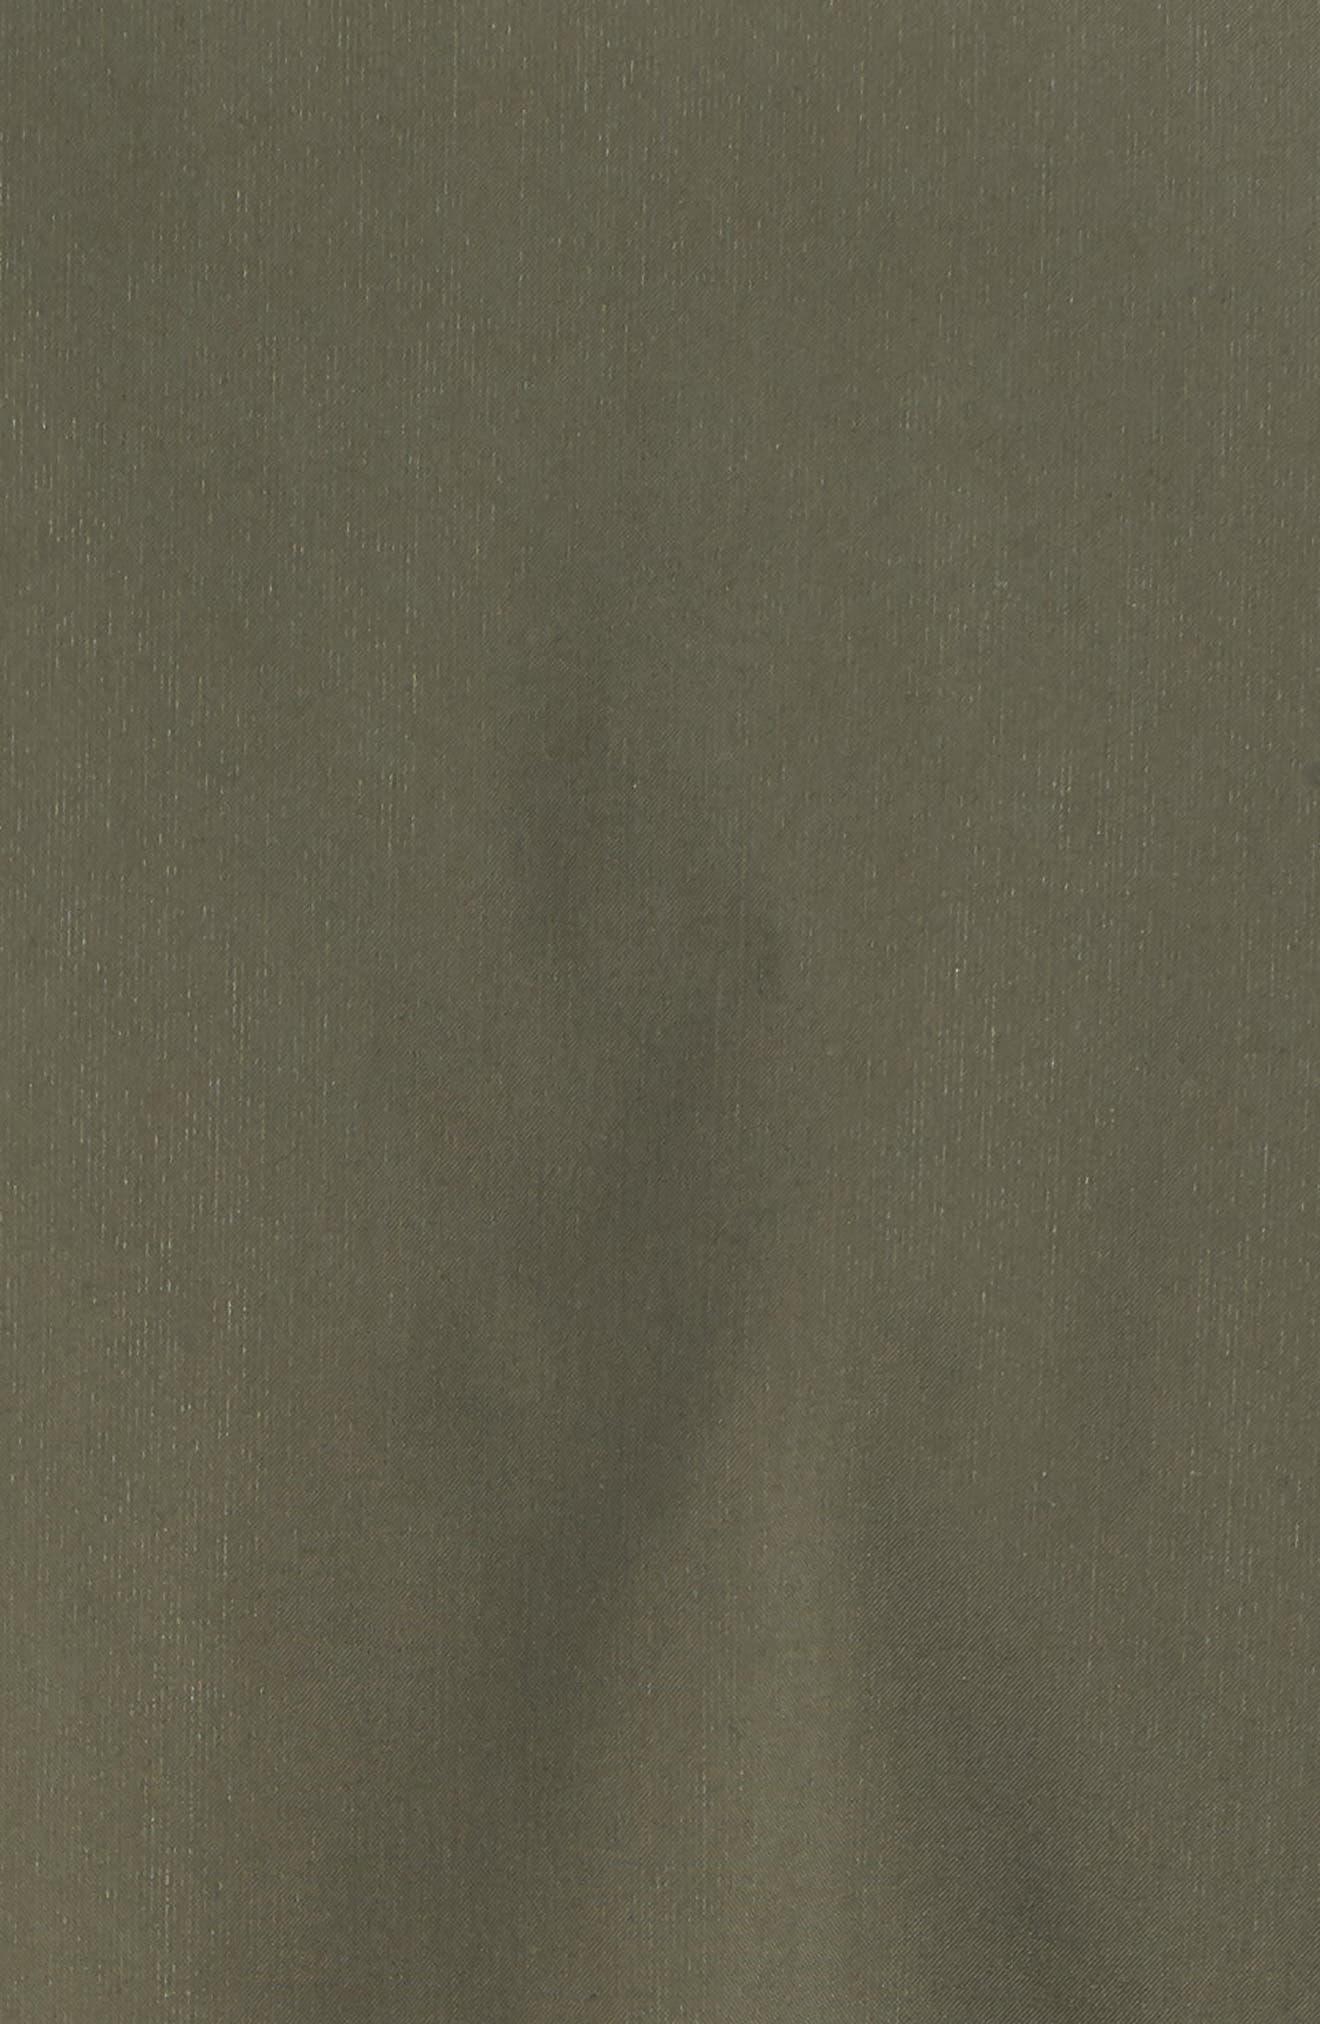 Scarisbrick Waterproof Jacket,                             Alternate thumbnail 6, color,                             340